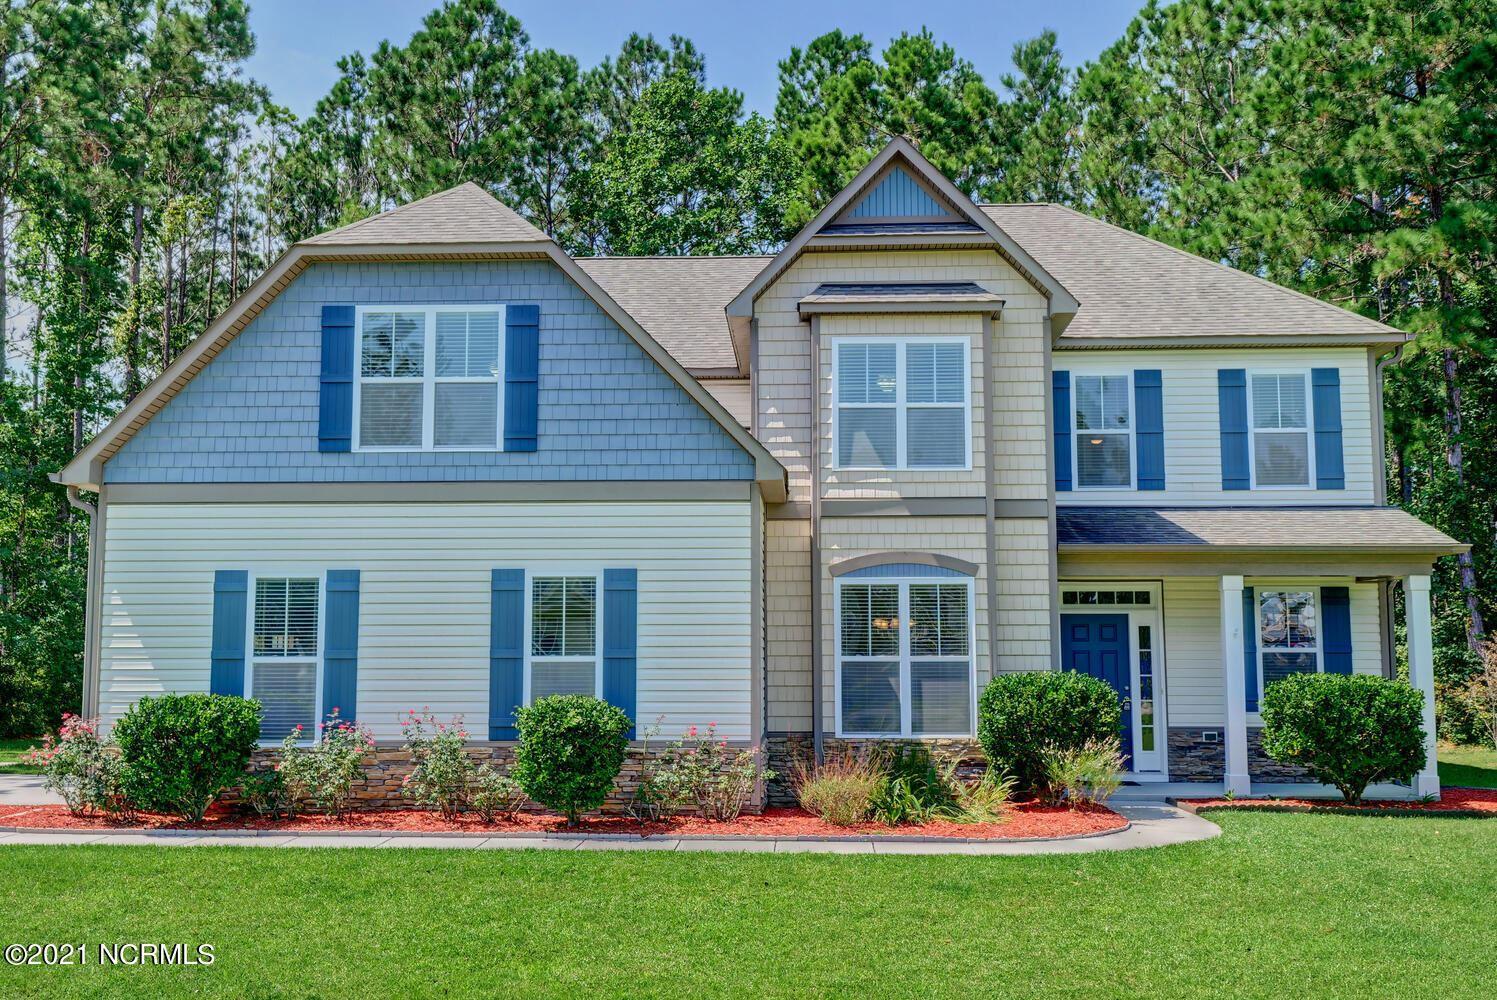 Photo of 422 Majestic Oaks Drive, Hampstead, NC 28443 (MLS # 100287853)